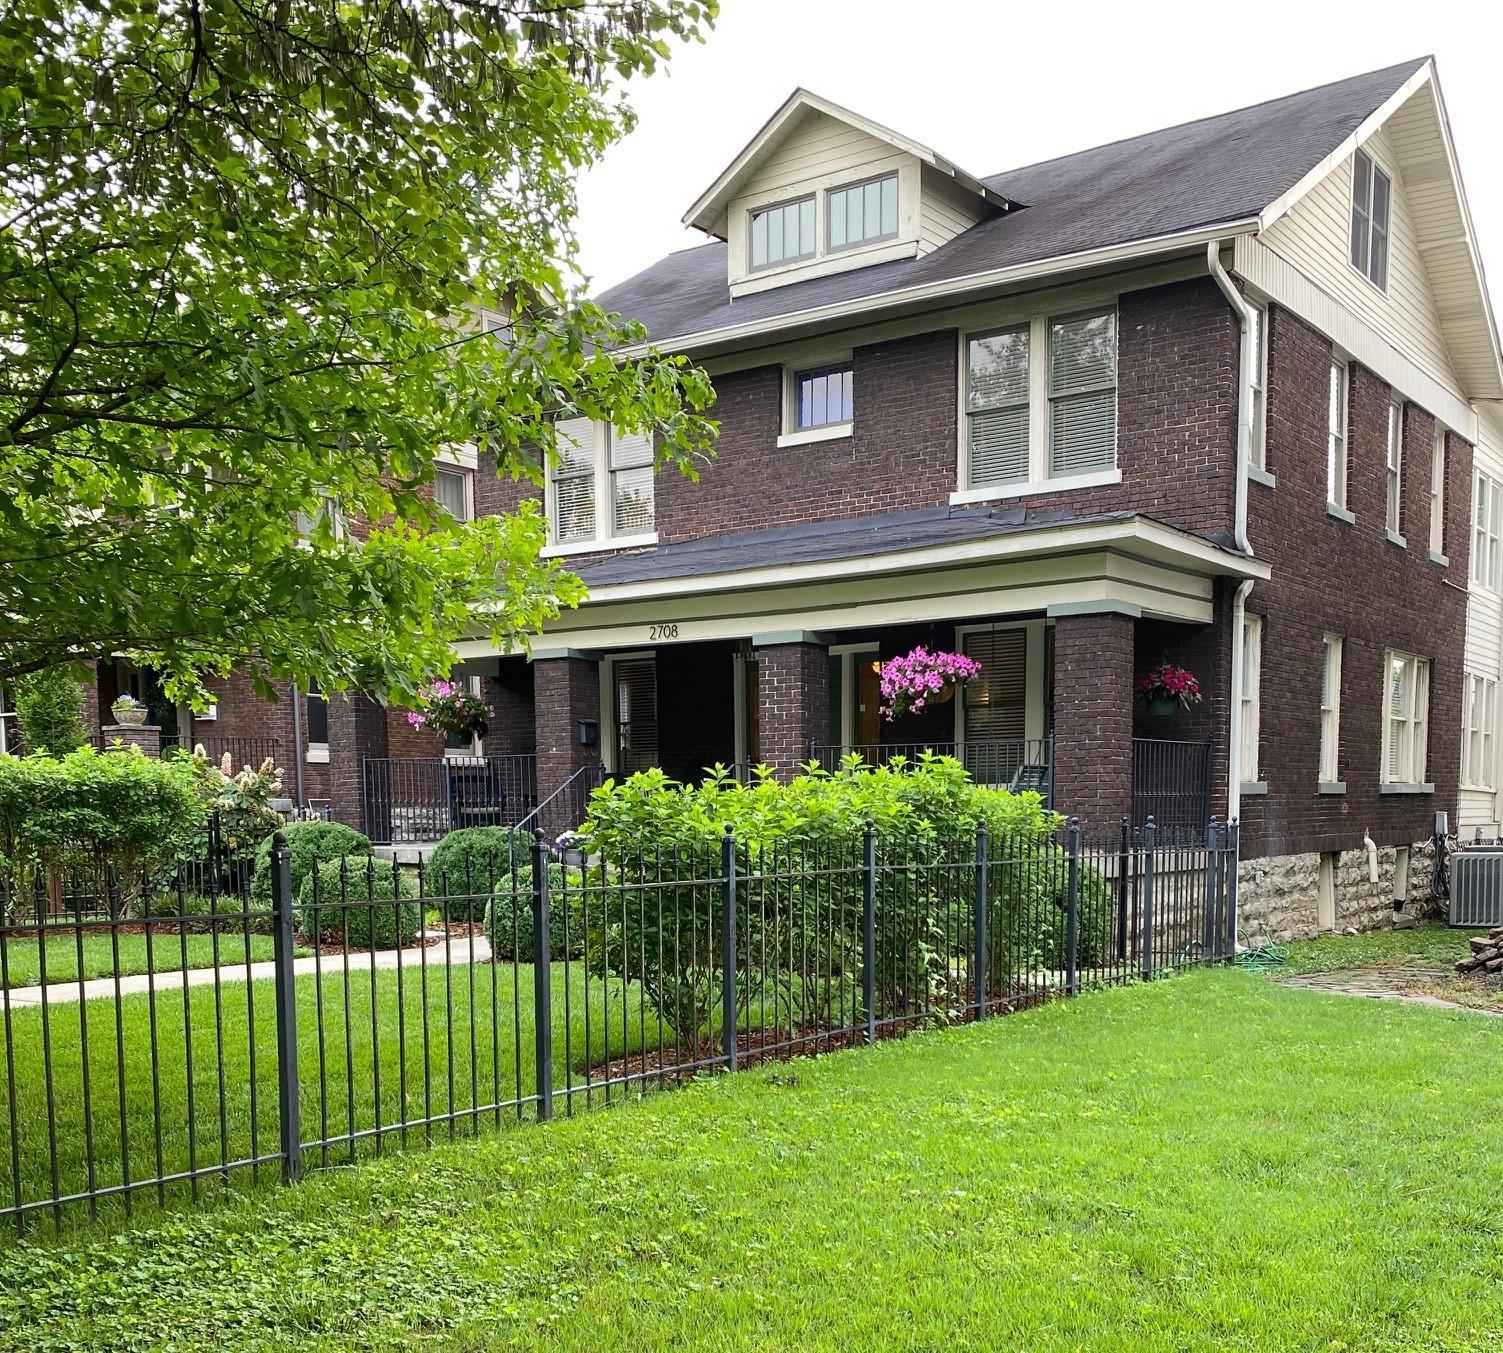 2708 Belmont Blvd Property Photo 1